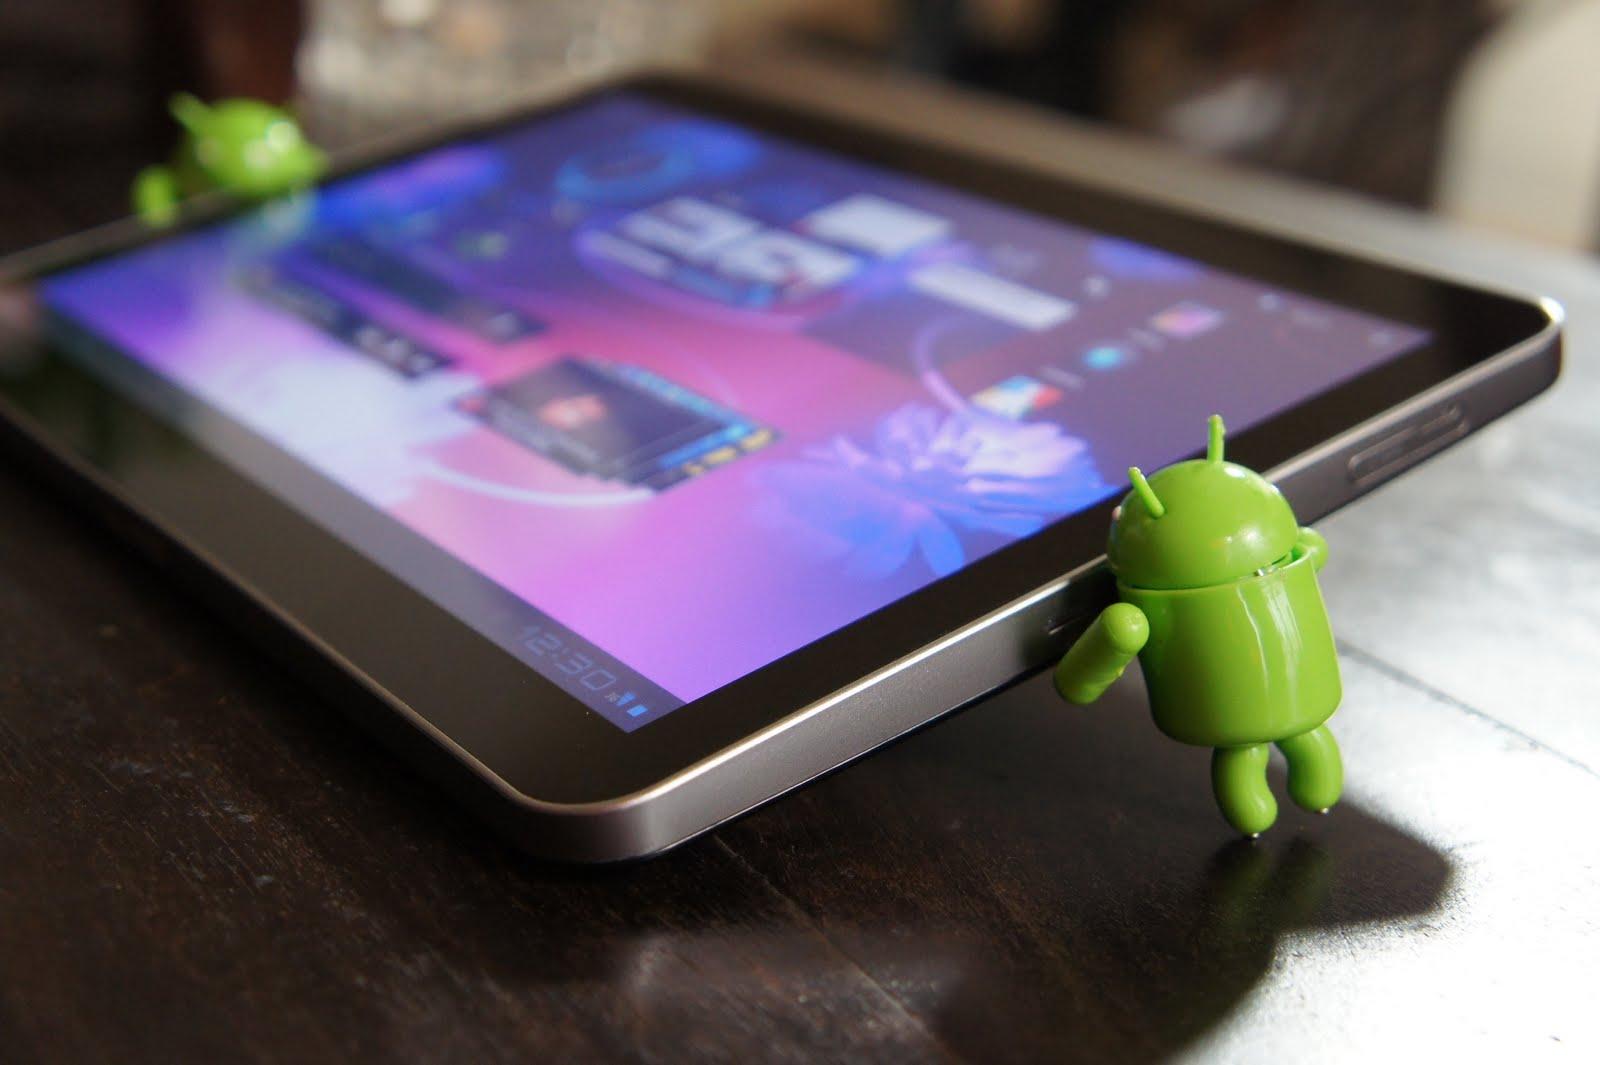 Galaxy Tab 10 1 Rom Cleanrom Installs Android 3 2 Honeycomb